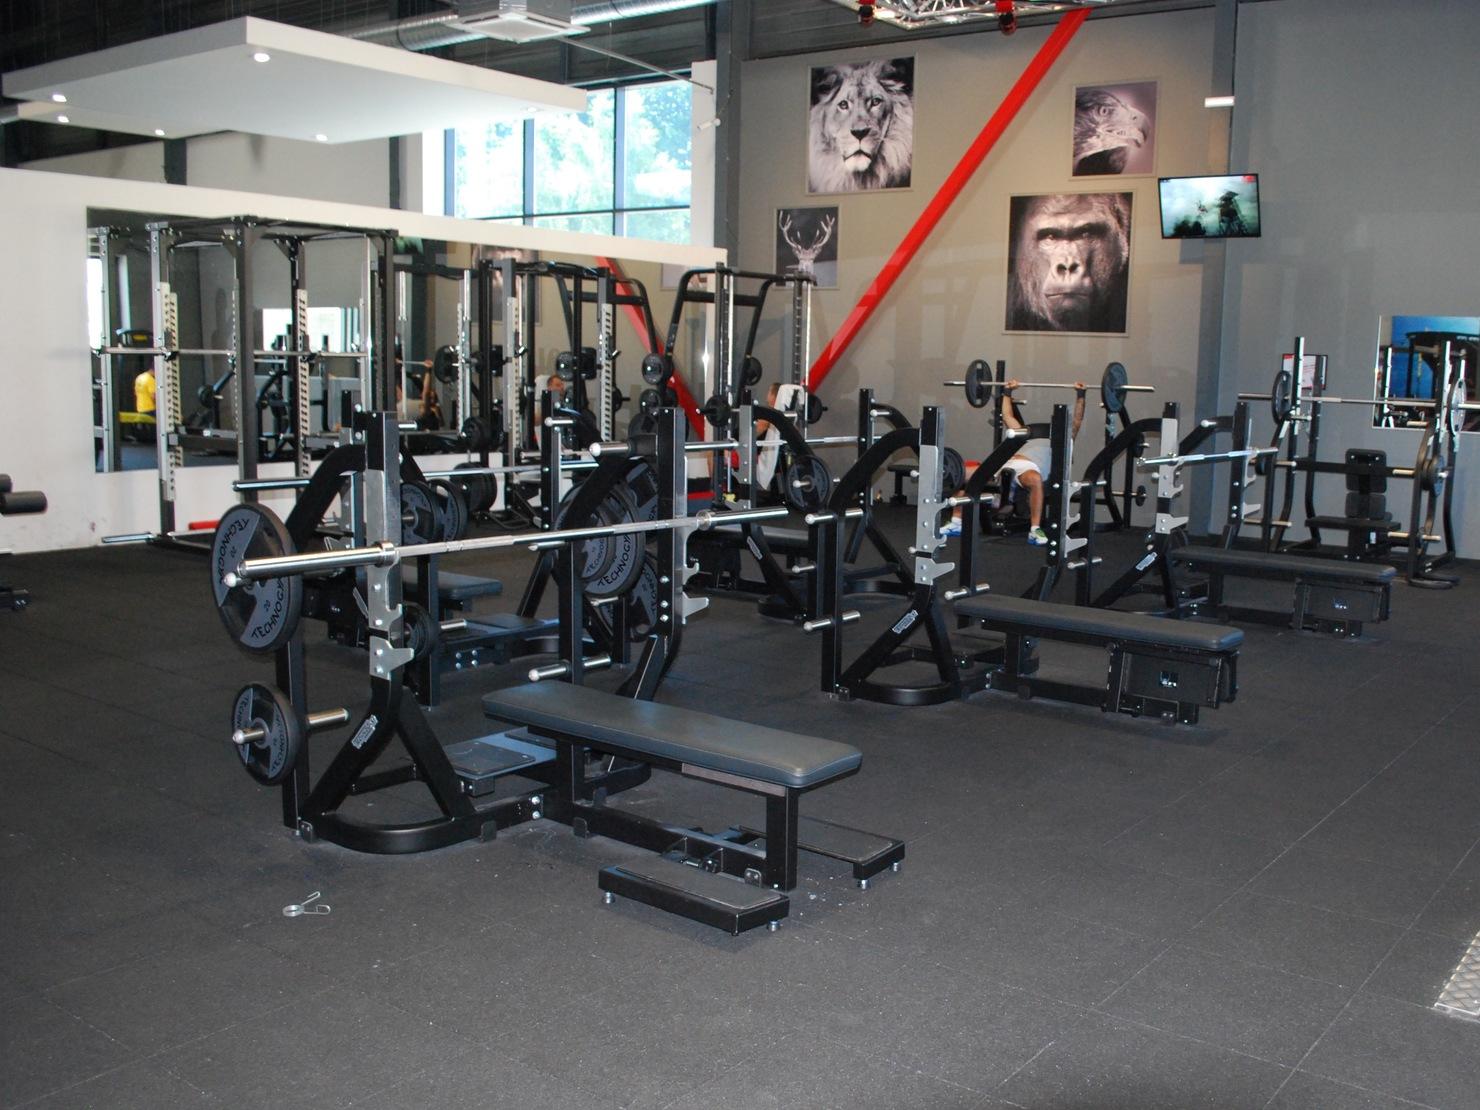 one fitness club strasbourg tarifs avis horaires essai gratuit. Black Bedroom Furniture Sets. Home Design Ideas